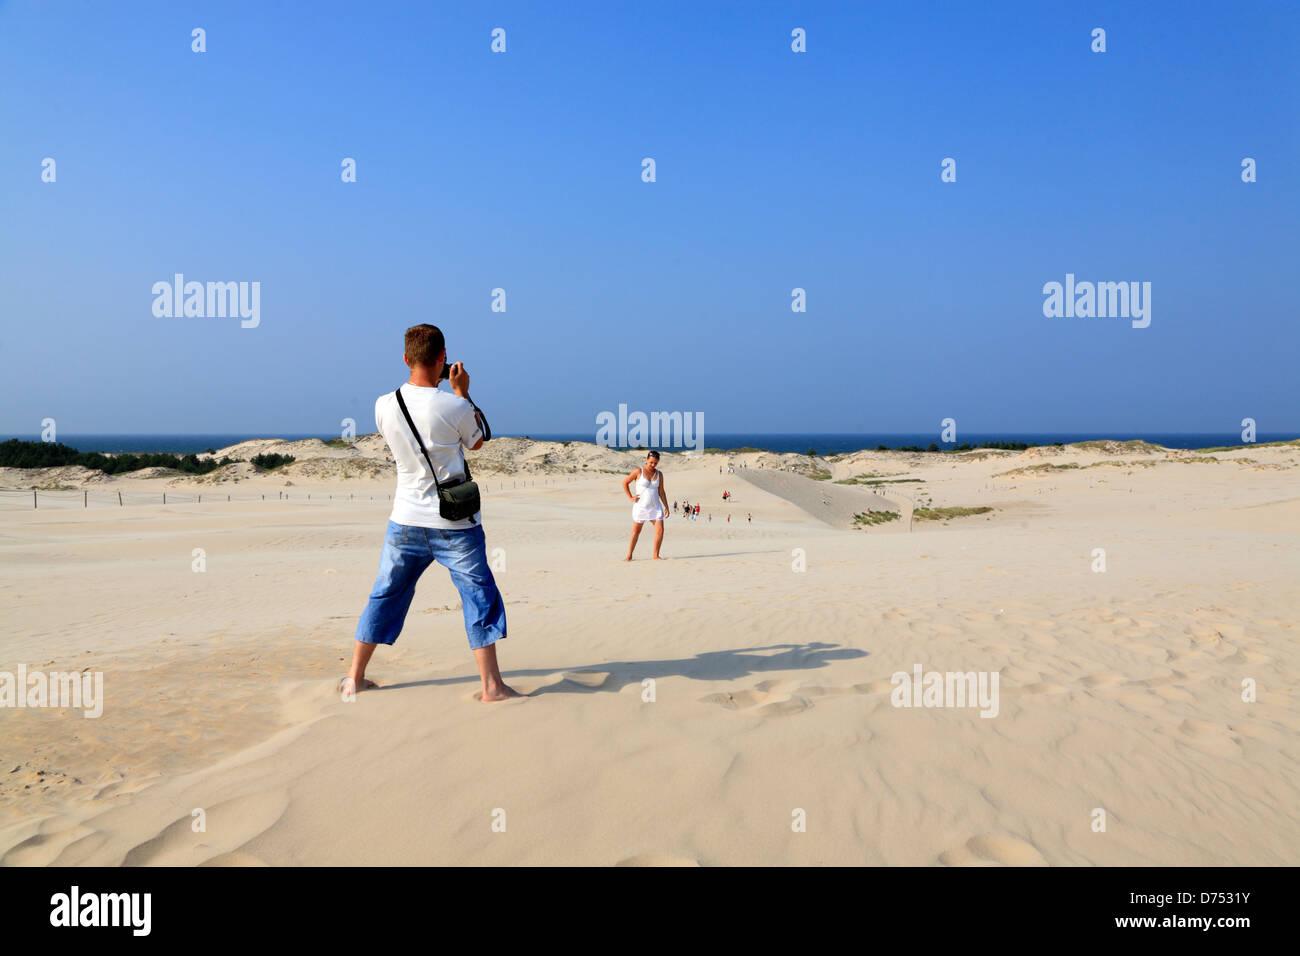 Slowinski National Park, dunes at Leba, baltic sea, Pomerania, Poland - Stock Image